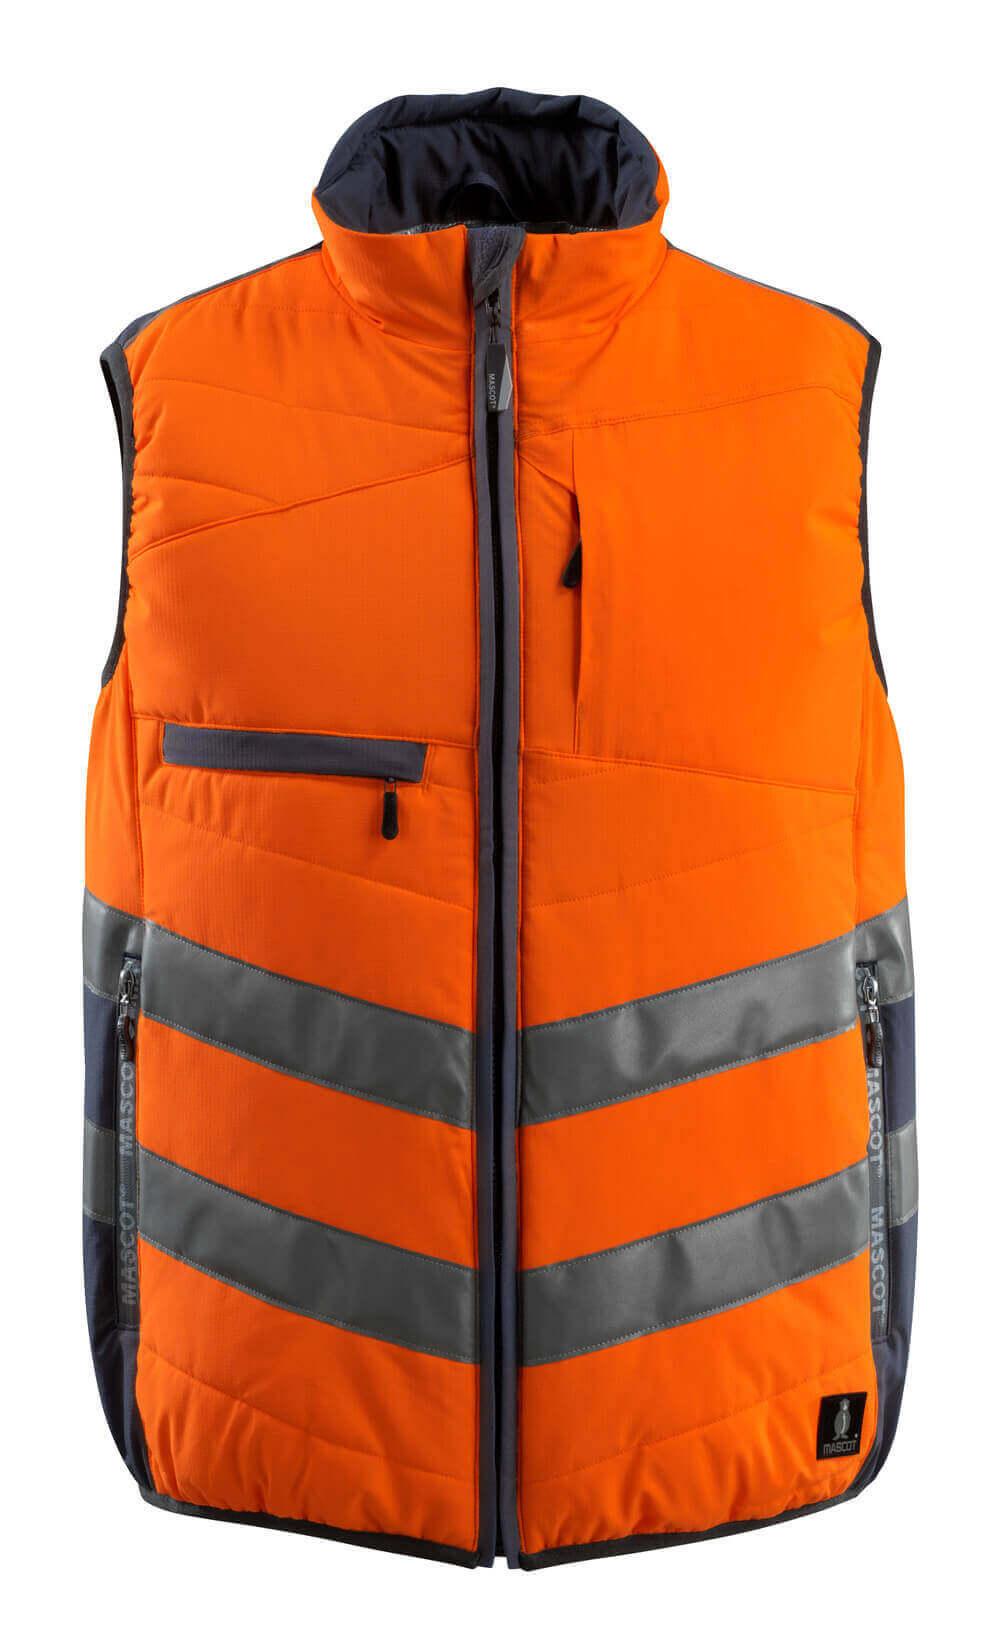 15565-249-14010 Gilet grand froid - Hi-vis orange/Marine foncé